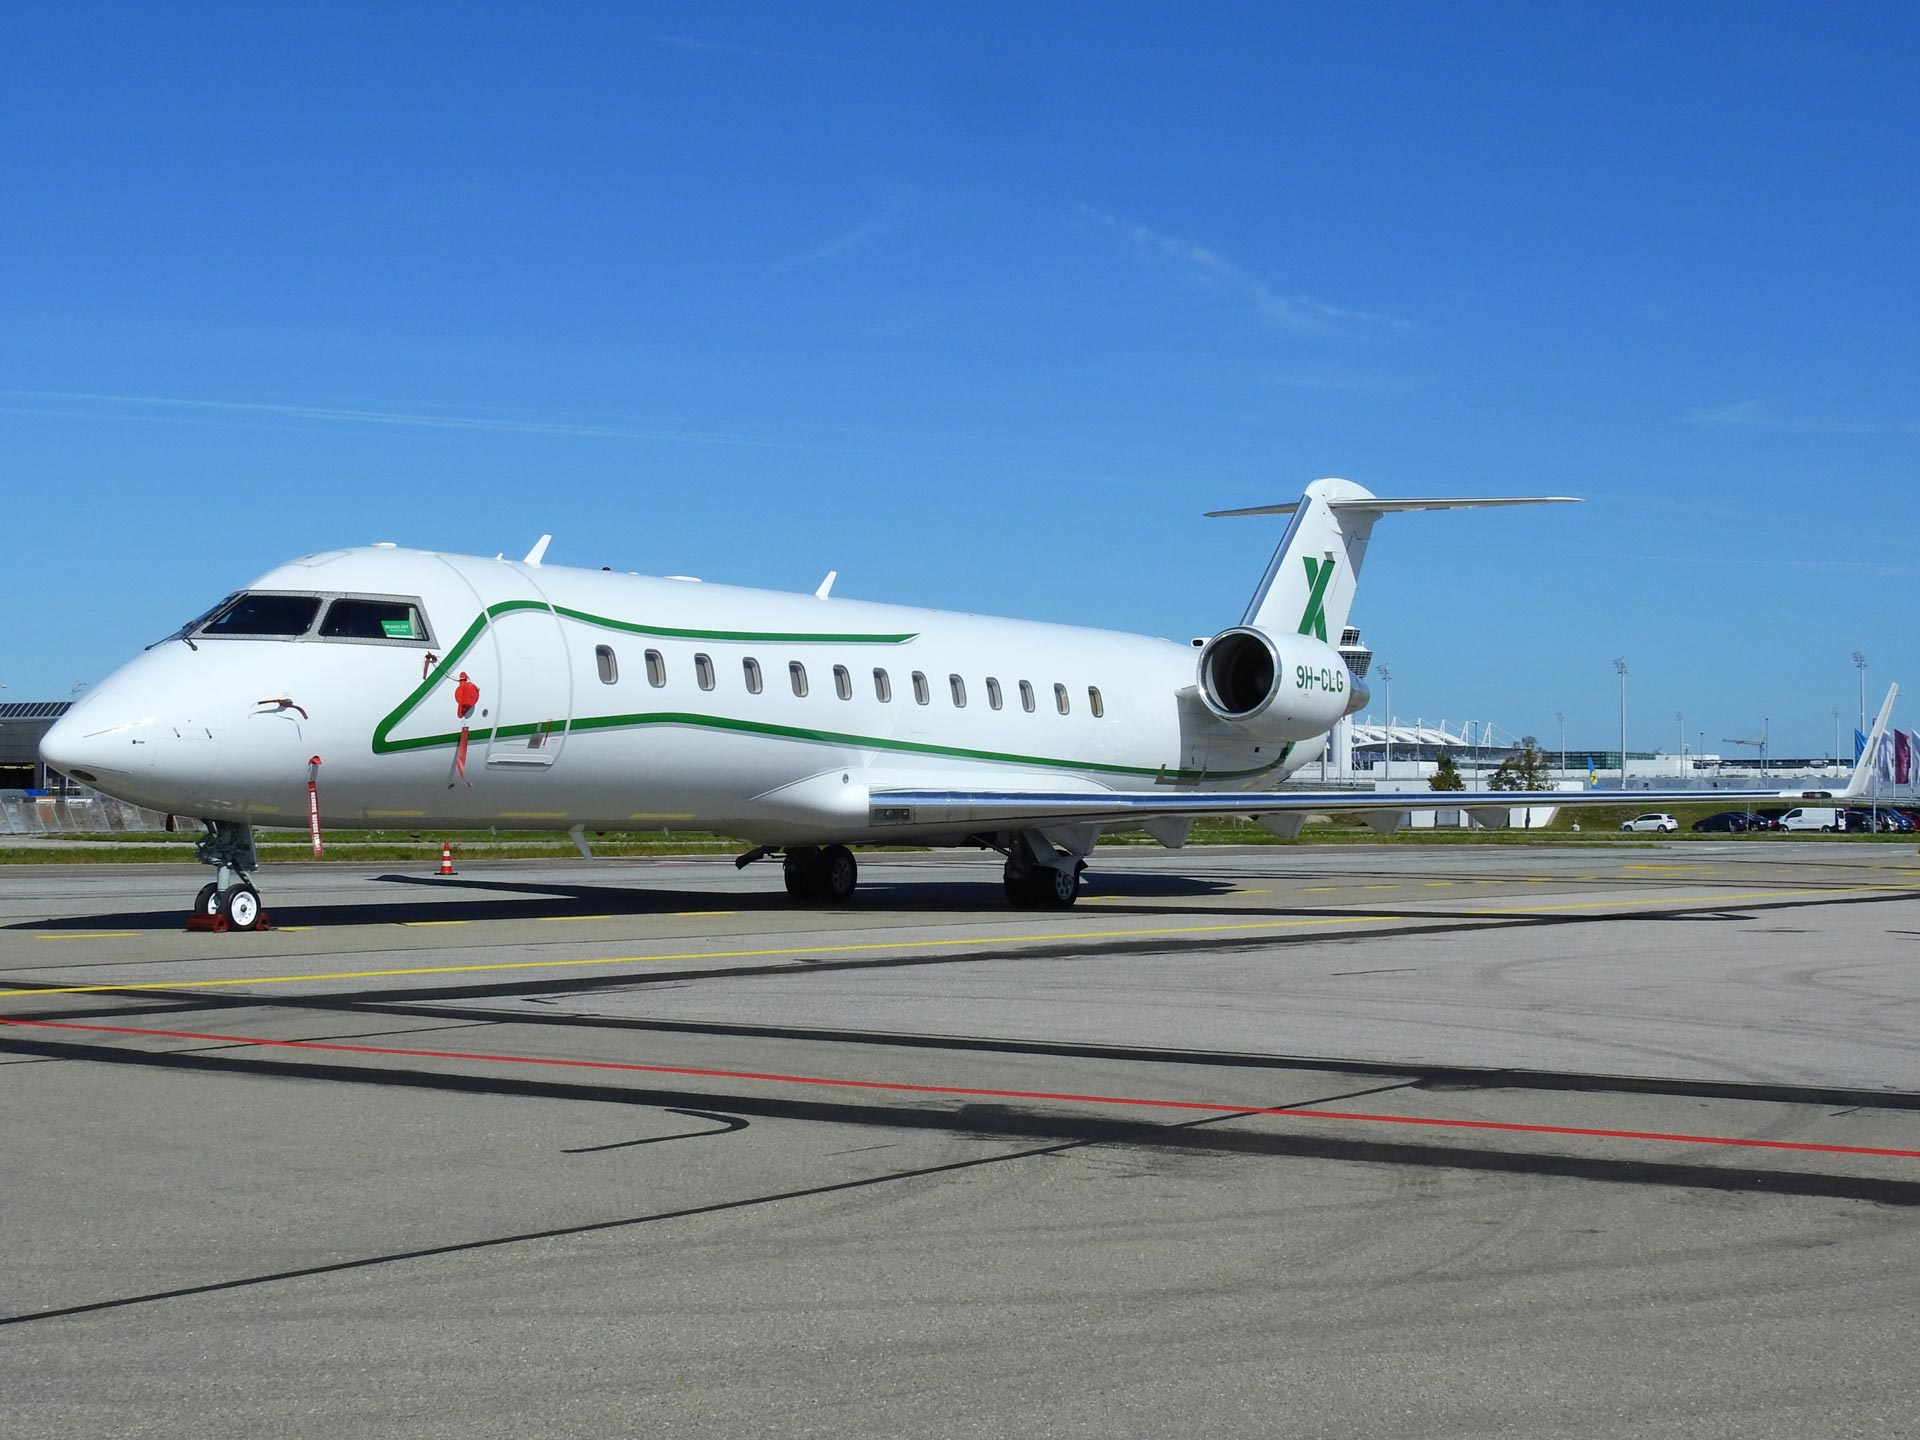 Eugen-Peteler-9H-CLG-AIR-X-Charter-Bombardier-Challenger-850-(CL-600-2B19)-(2)